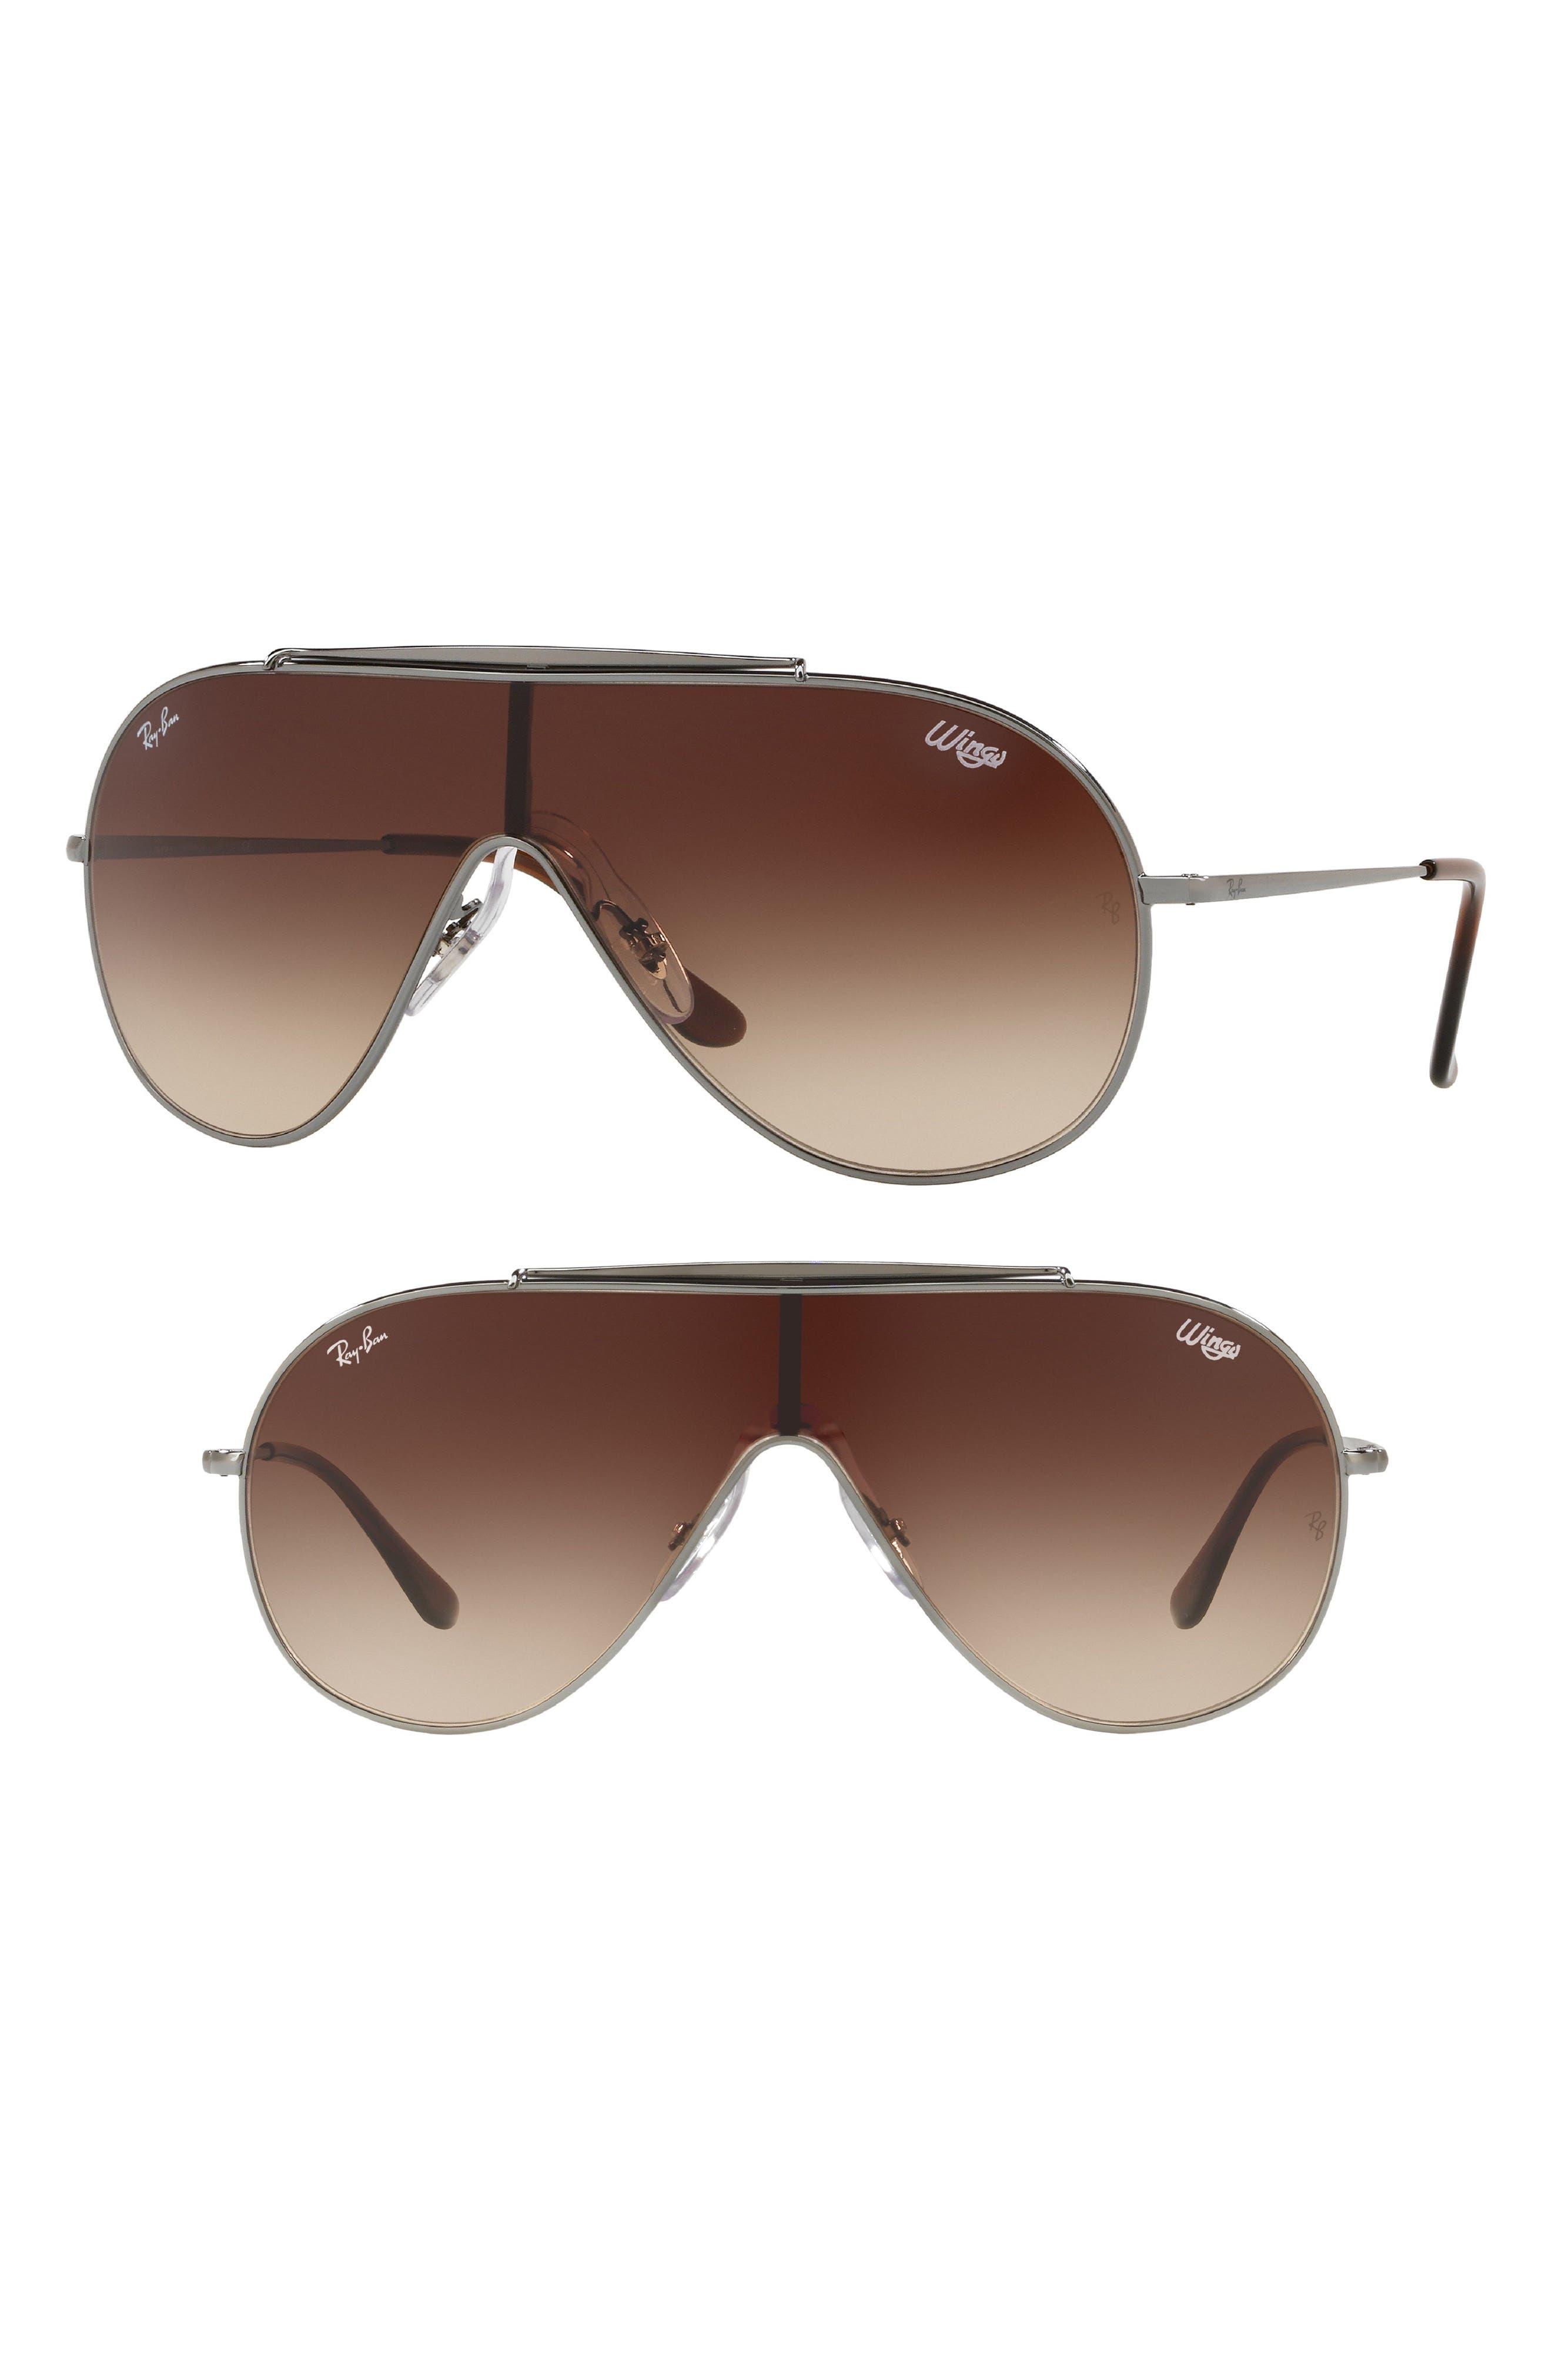 133mm Shield Sunglasses,                             Main thumbnail 1, color,                             Gunmetal Gradient